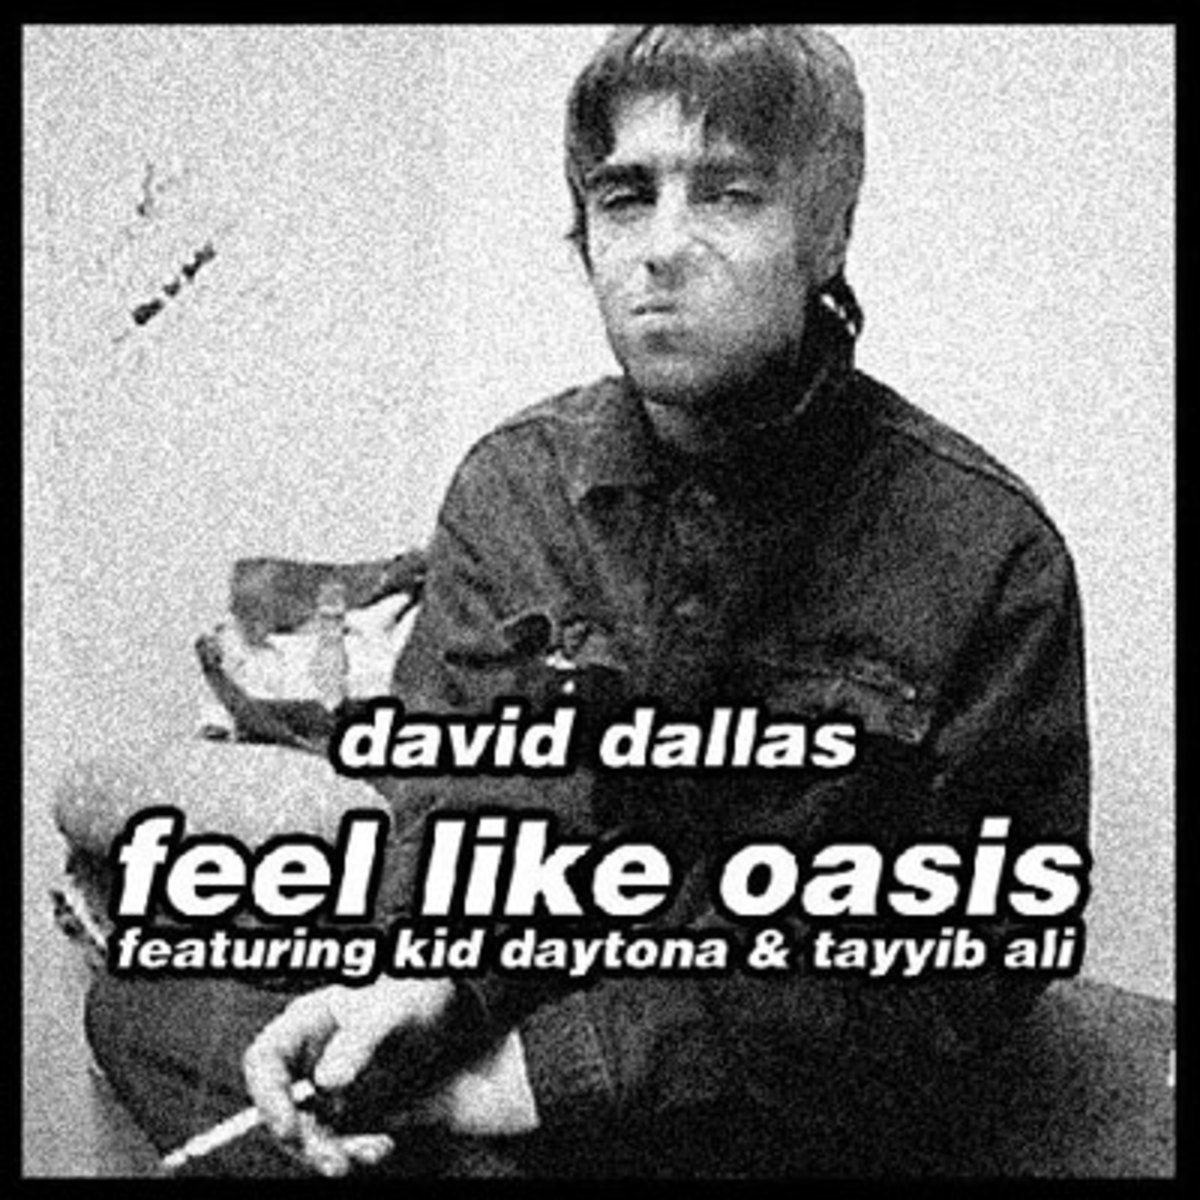 daviddallas-feellikeoasis.jpg